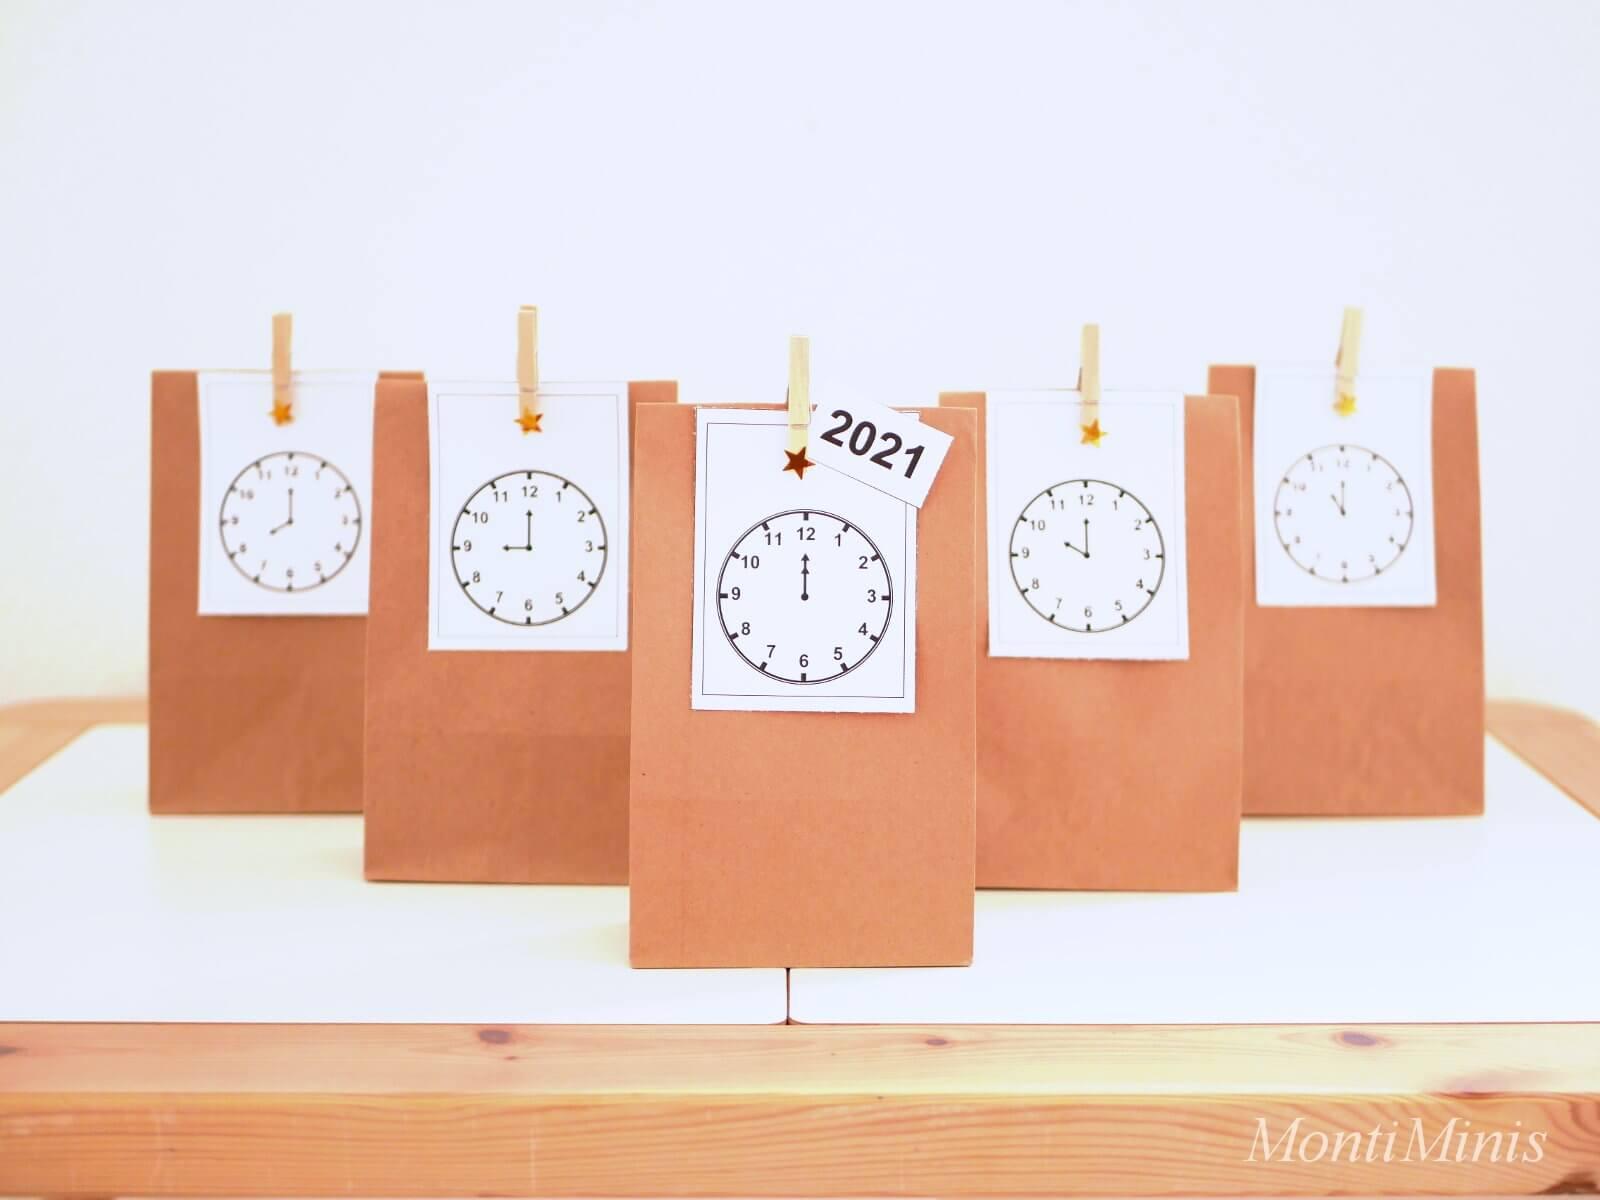 Silvester Countdown-Tüten & Das MontiMinis Silvester Paket (Gratis Download)